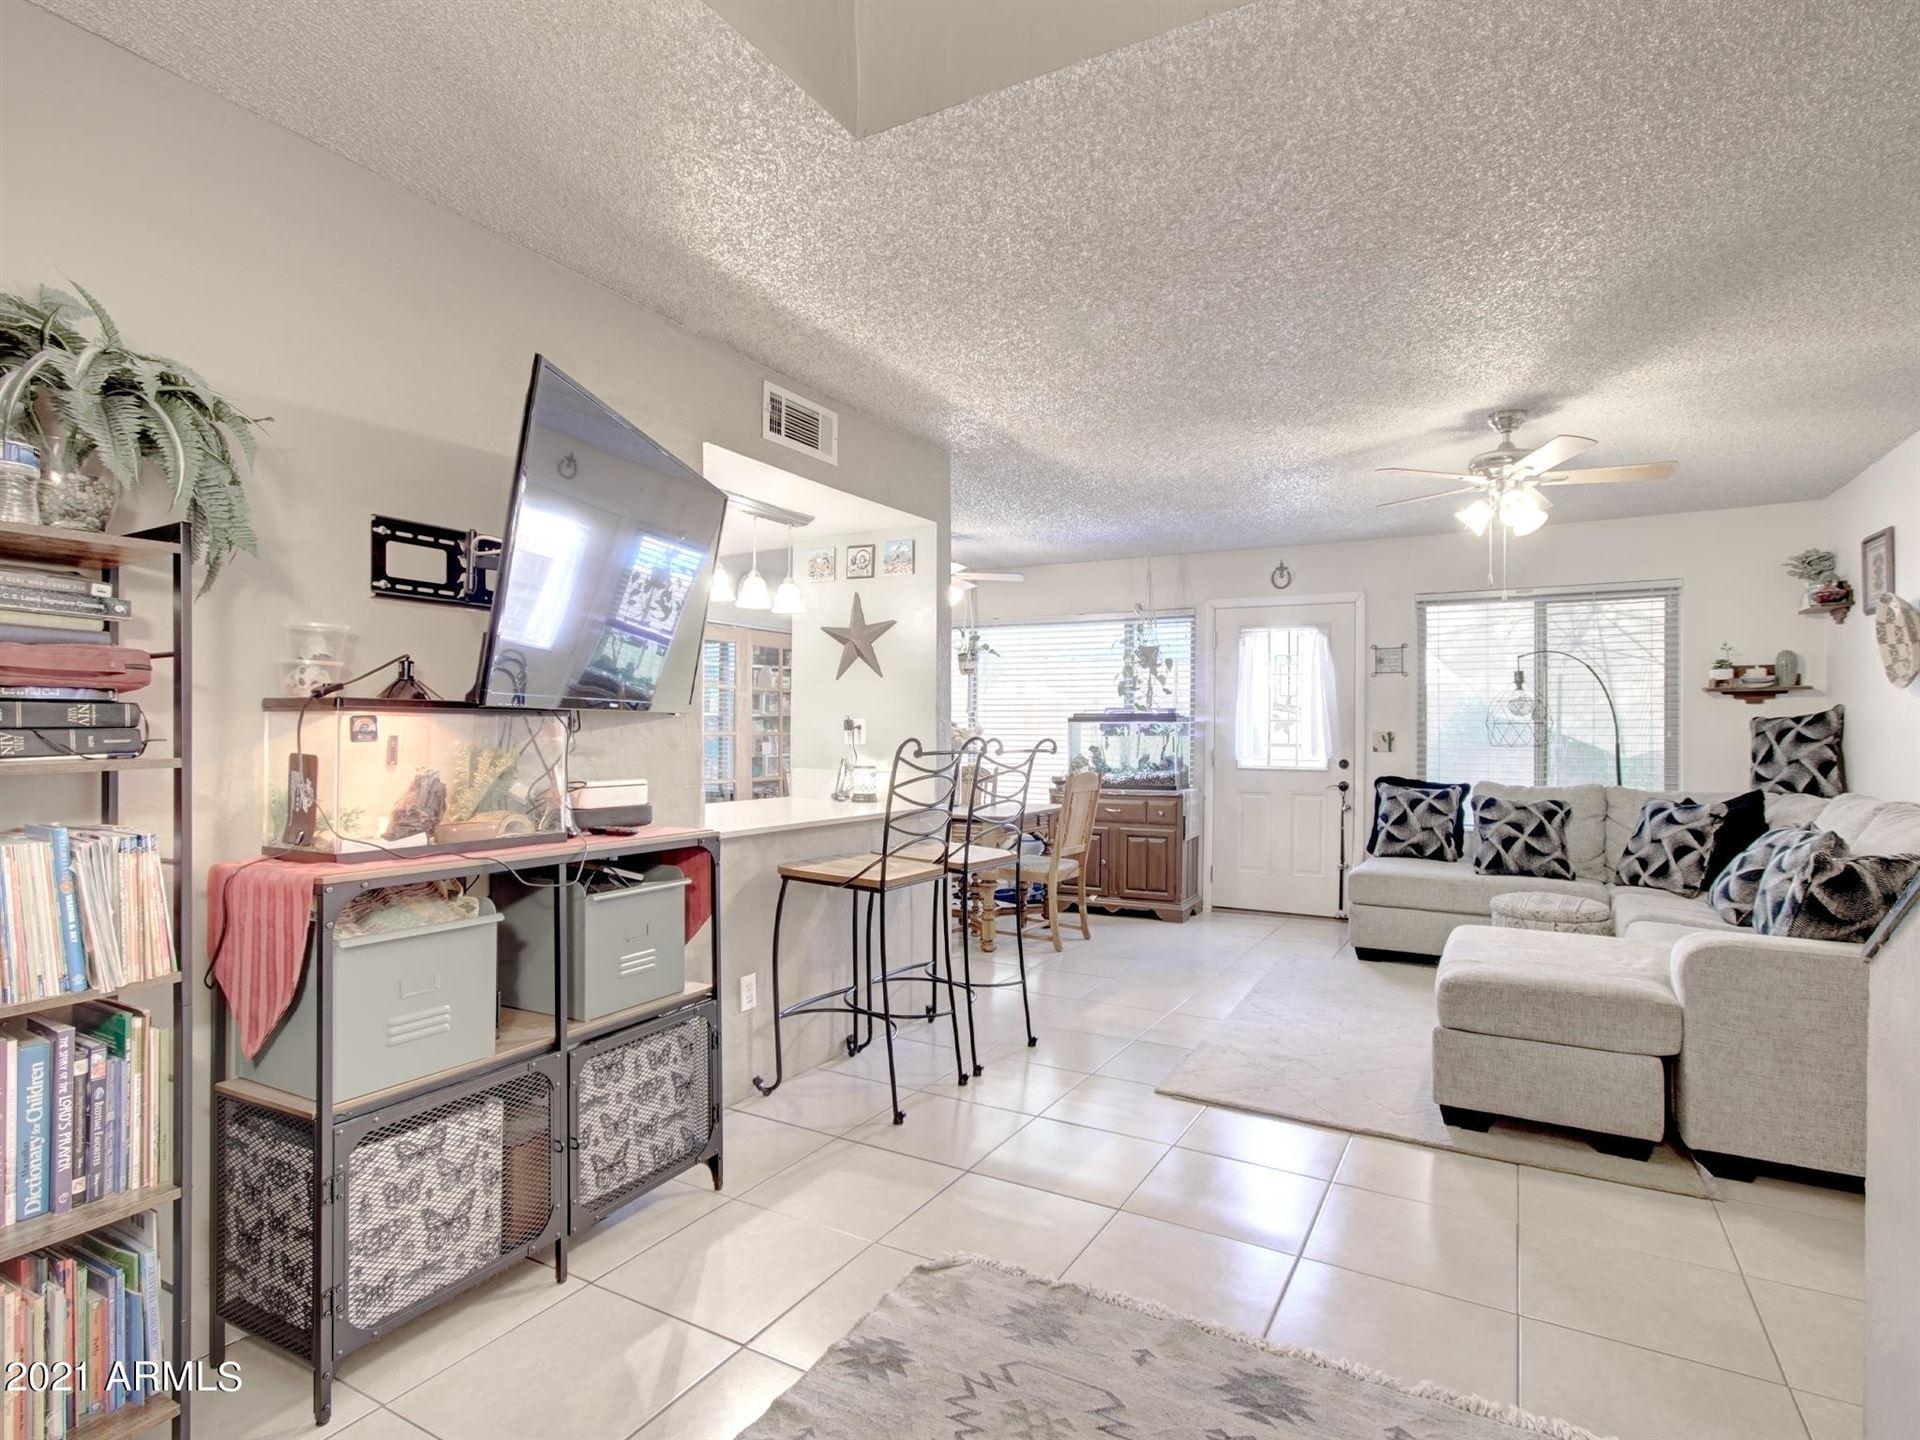 Photo of 4490 W PALMAIRE Avenue, Glendale, AZ 85301 (MLS # 6263020)